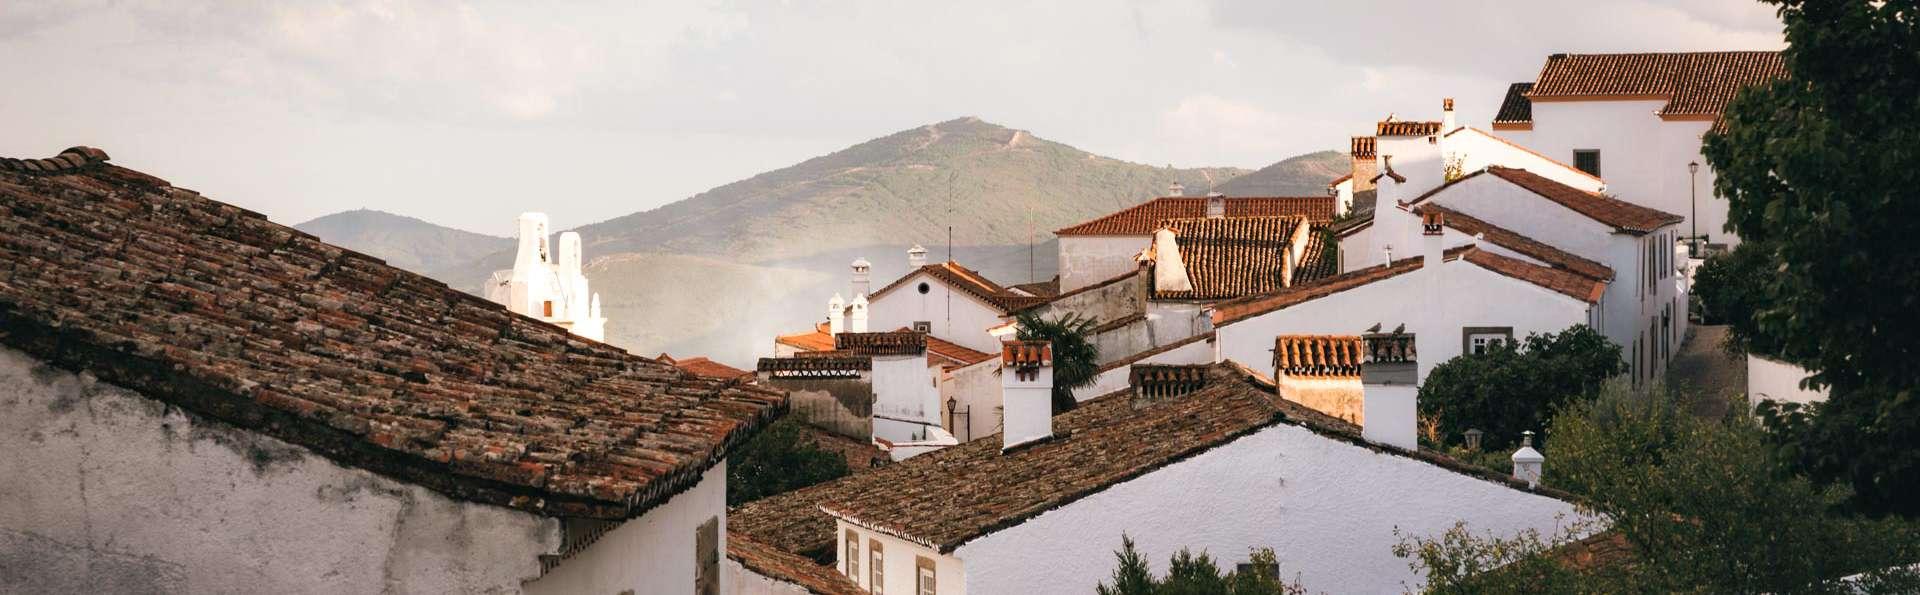 Casas do Côro - EDIT_DESTINATION_02.jpg